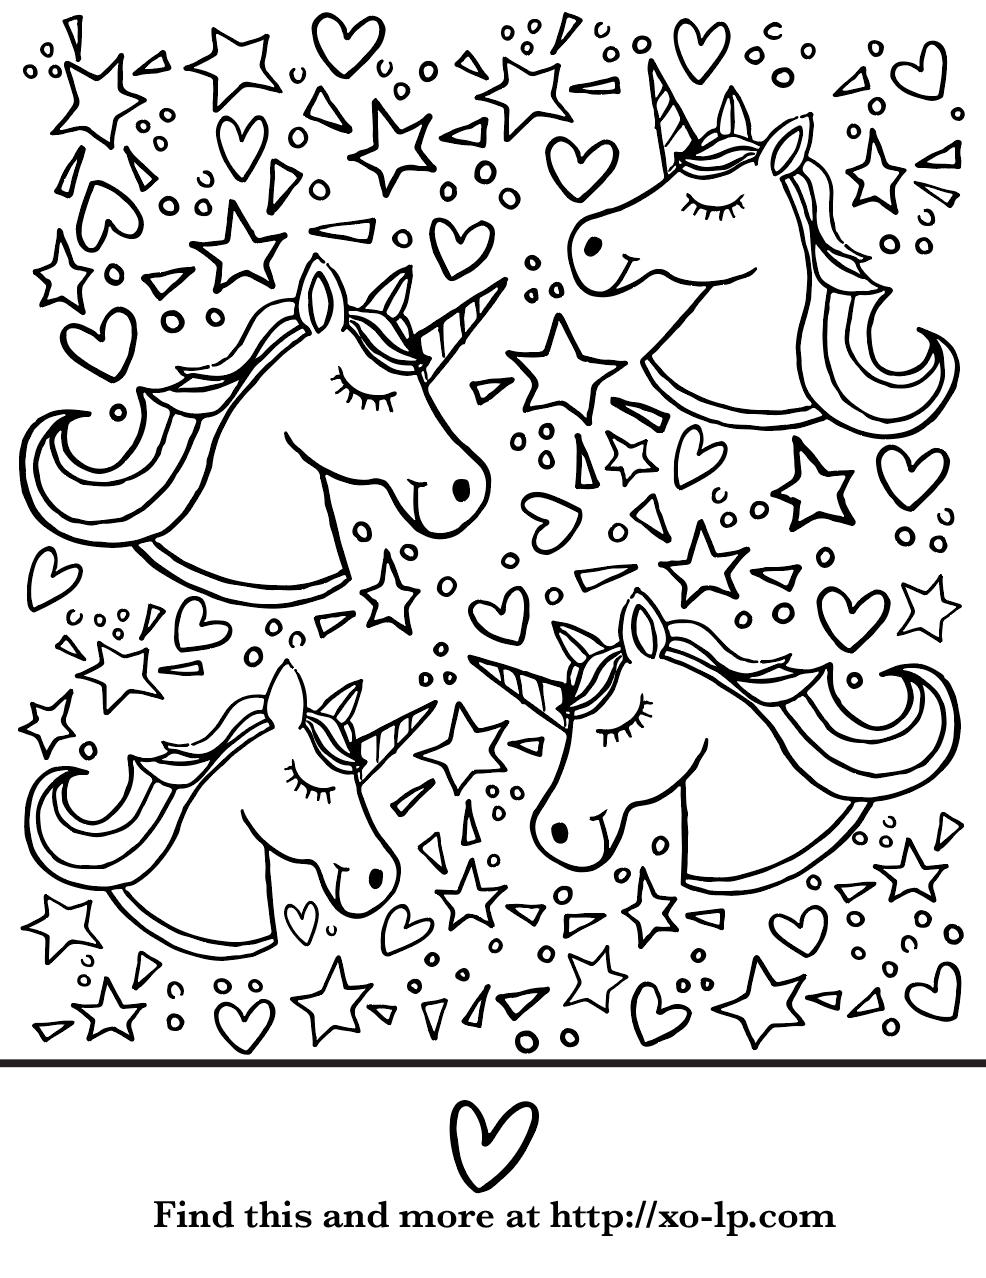 Unicorn Coloring Page Xo Lp Unicorn Coloring Pages Coloring Pages Halloween Coloring Pages [ 1278 x 986 Pixel ]